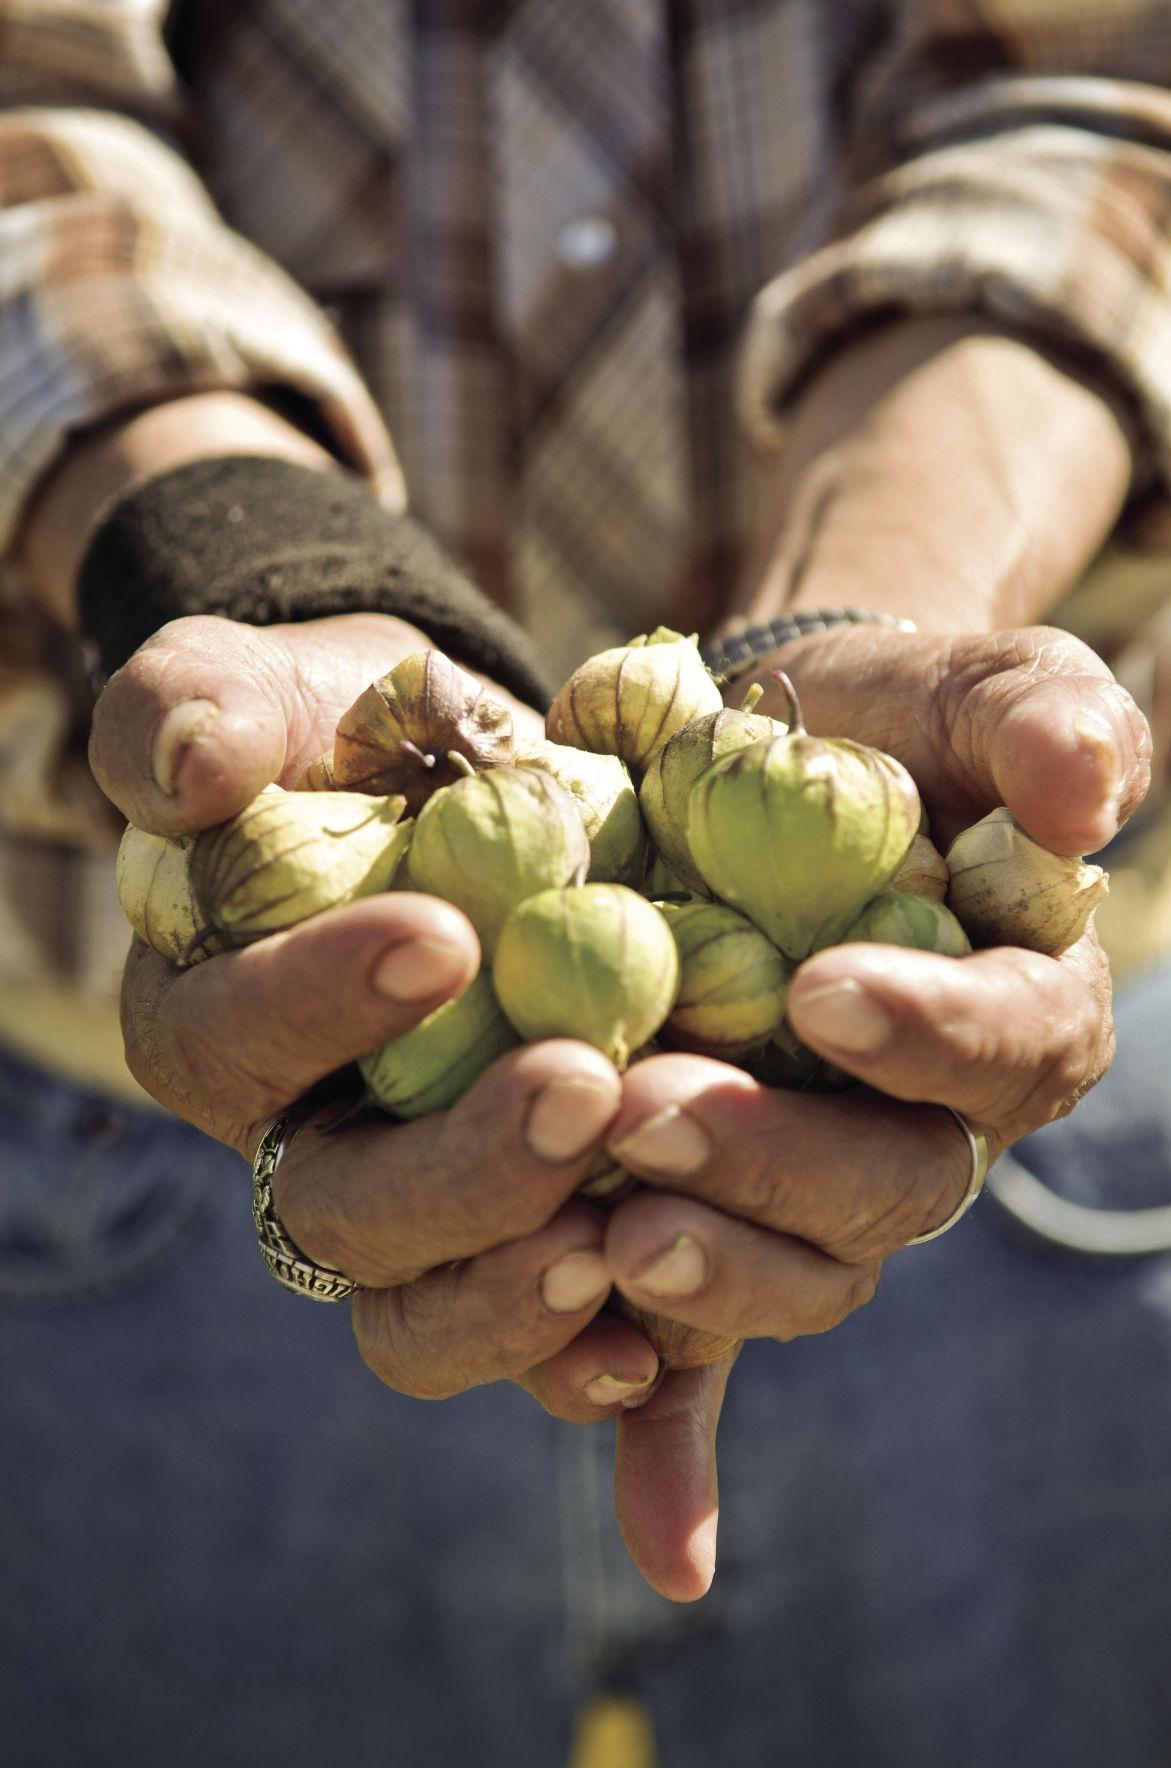 Genaro Esparza holds tomatillos